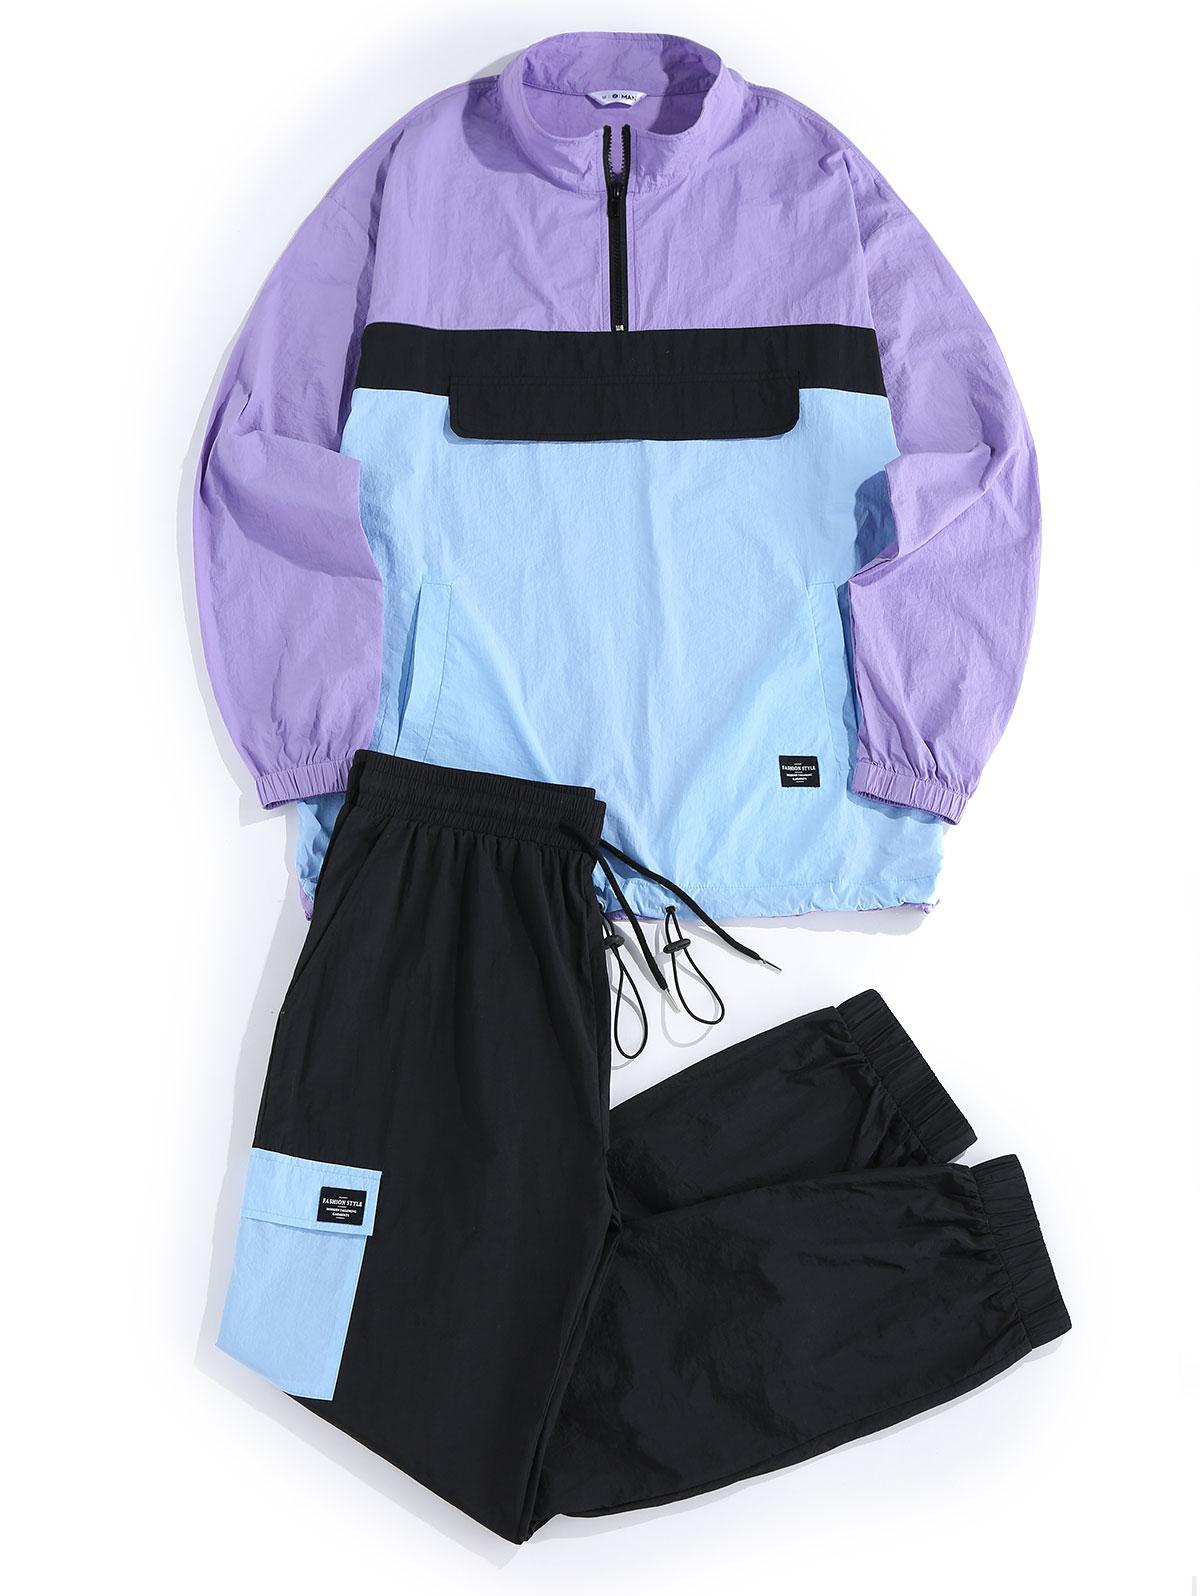 ZAFUL Colorblock Panel Jacket and Pants Set